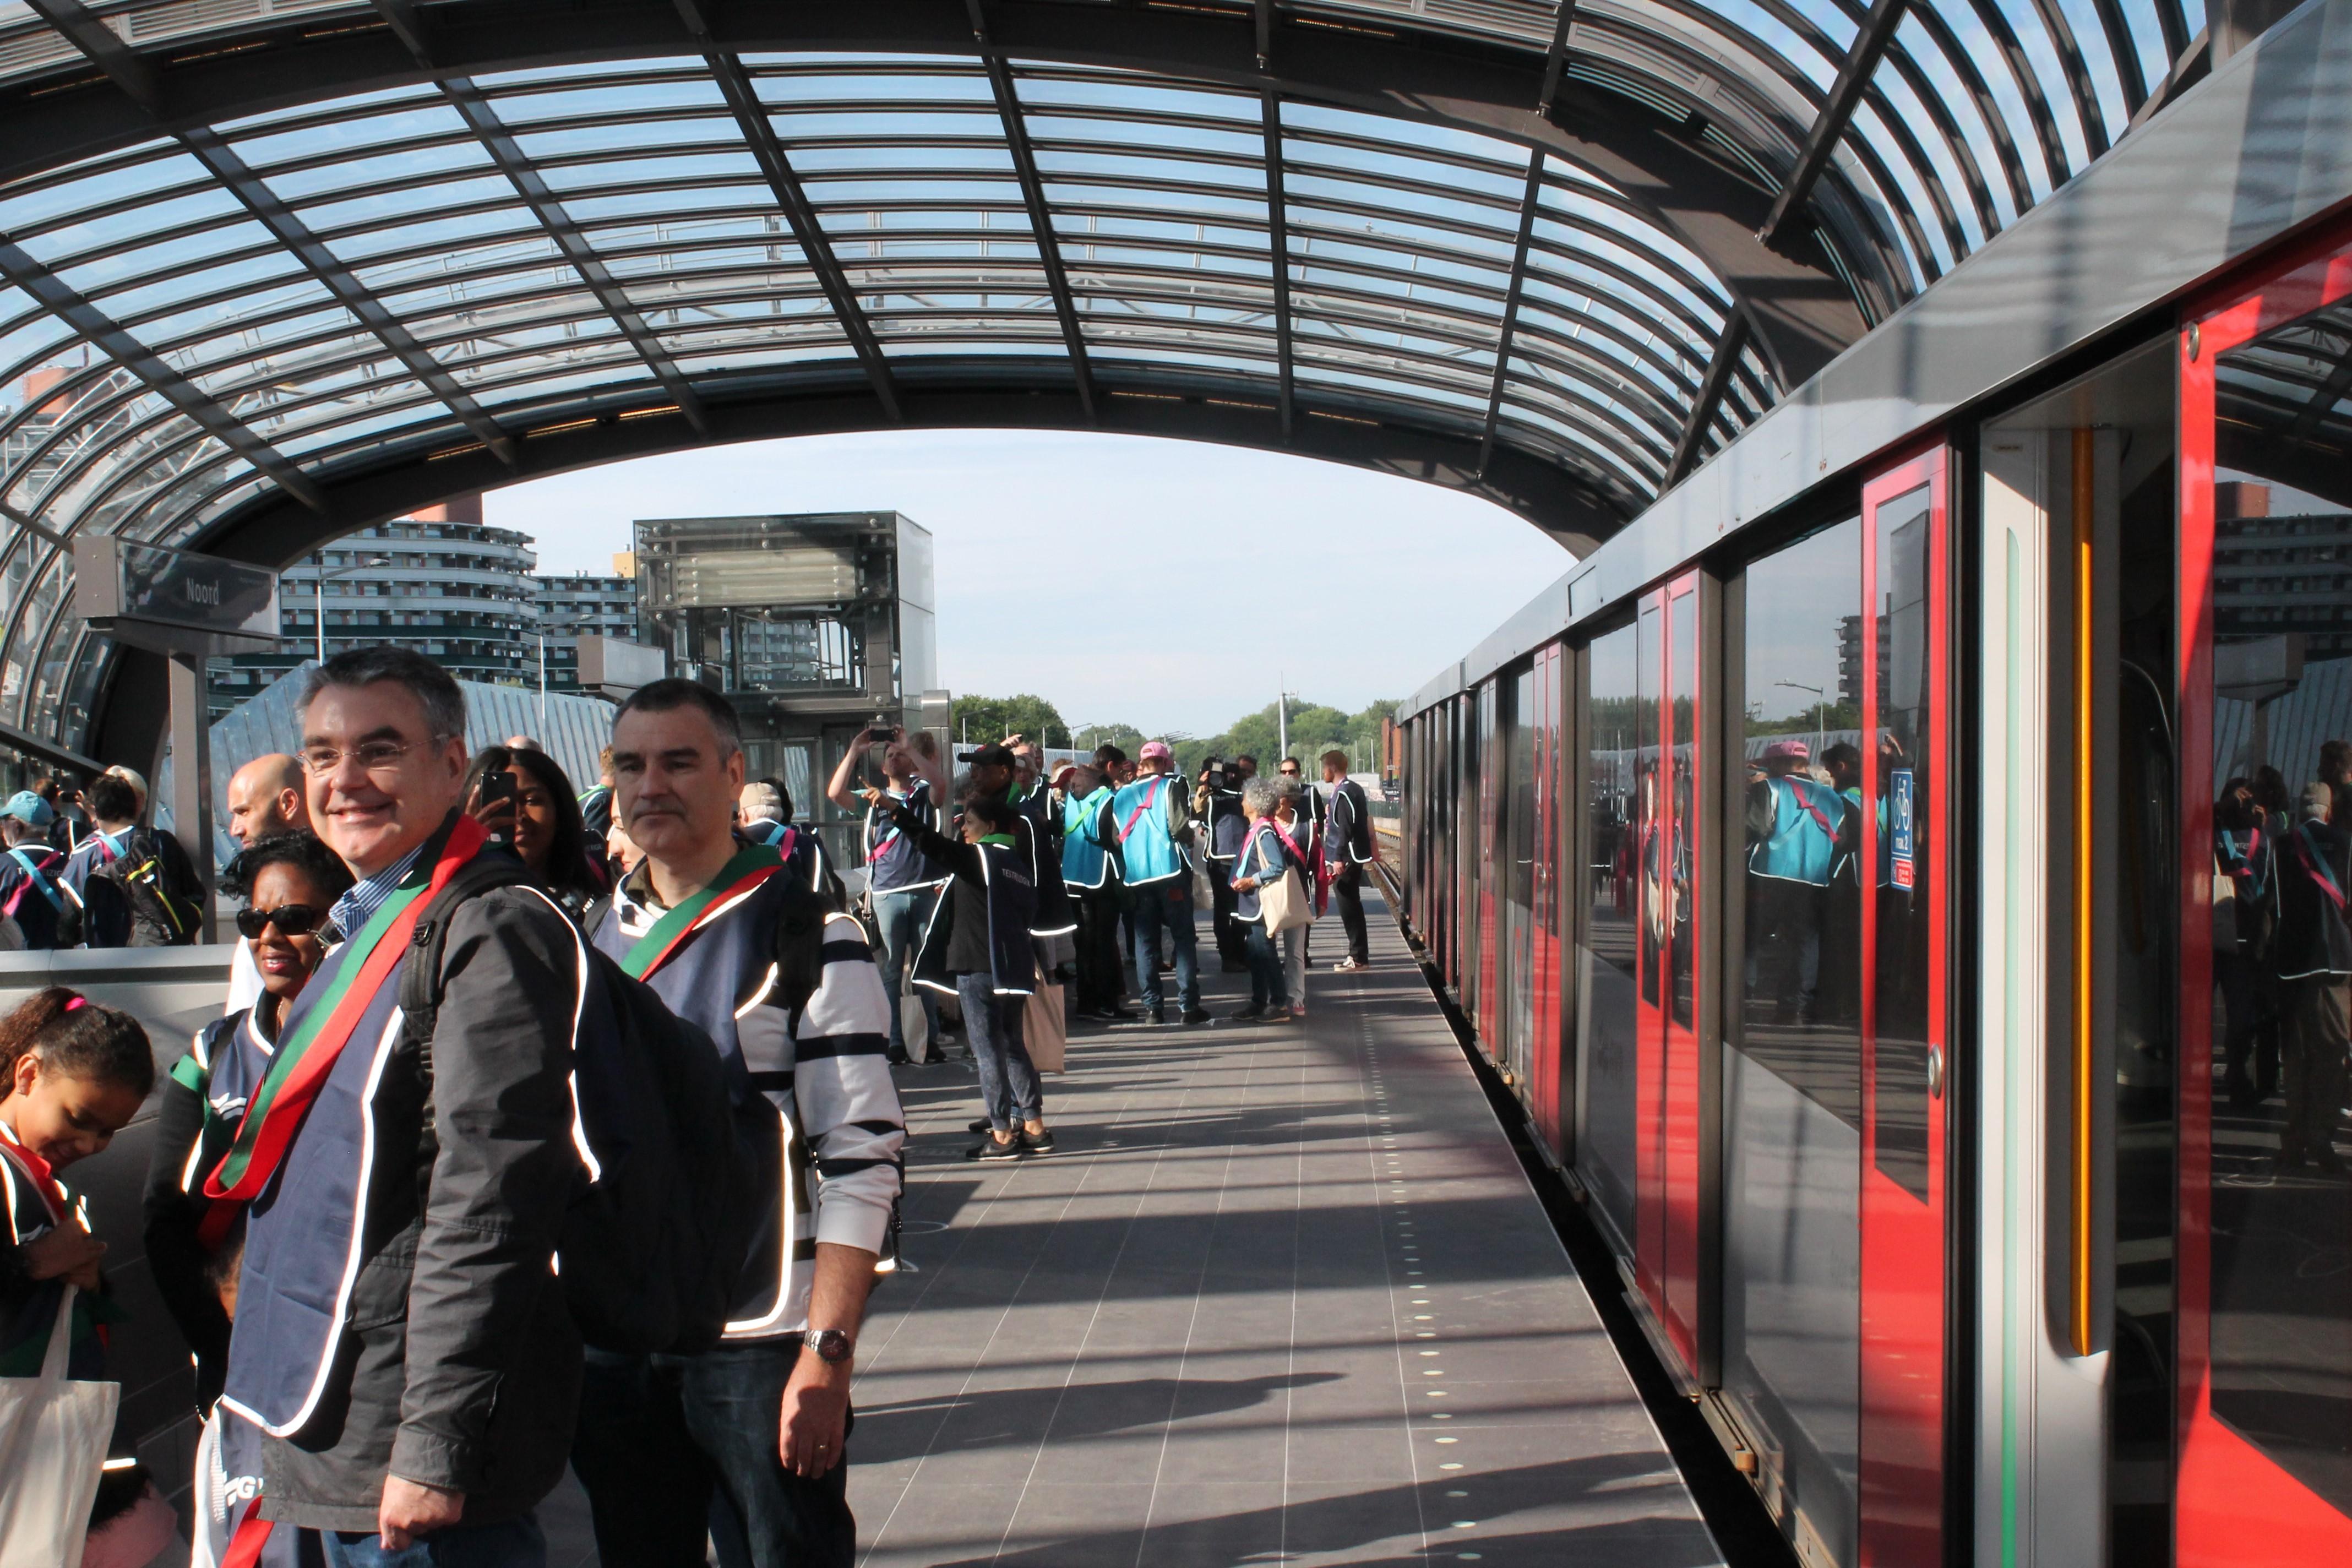 Testreizigers zijn gestrand op station Noord. (Foto: Wendy Ruittemanz/RM)